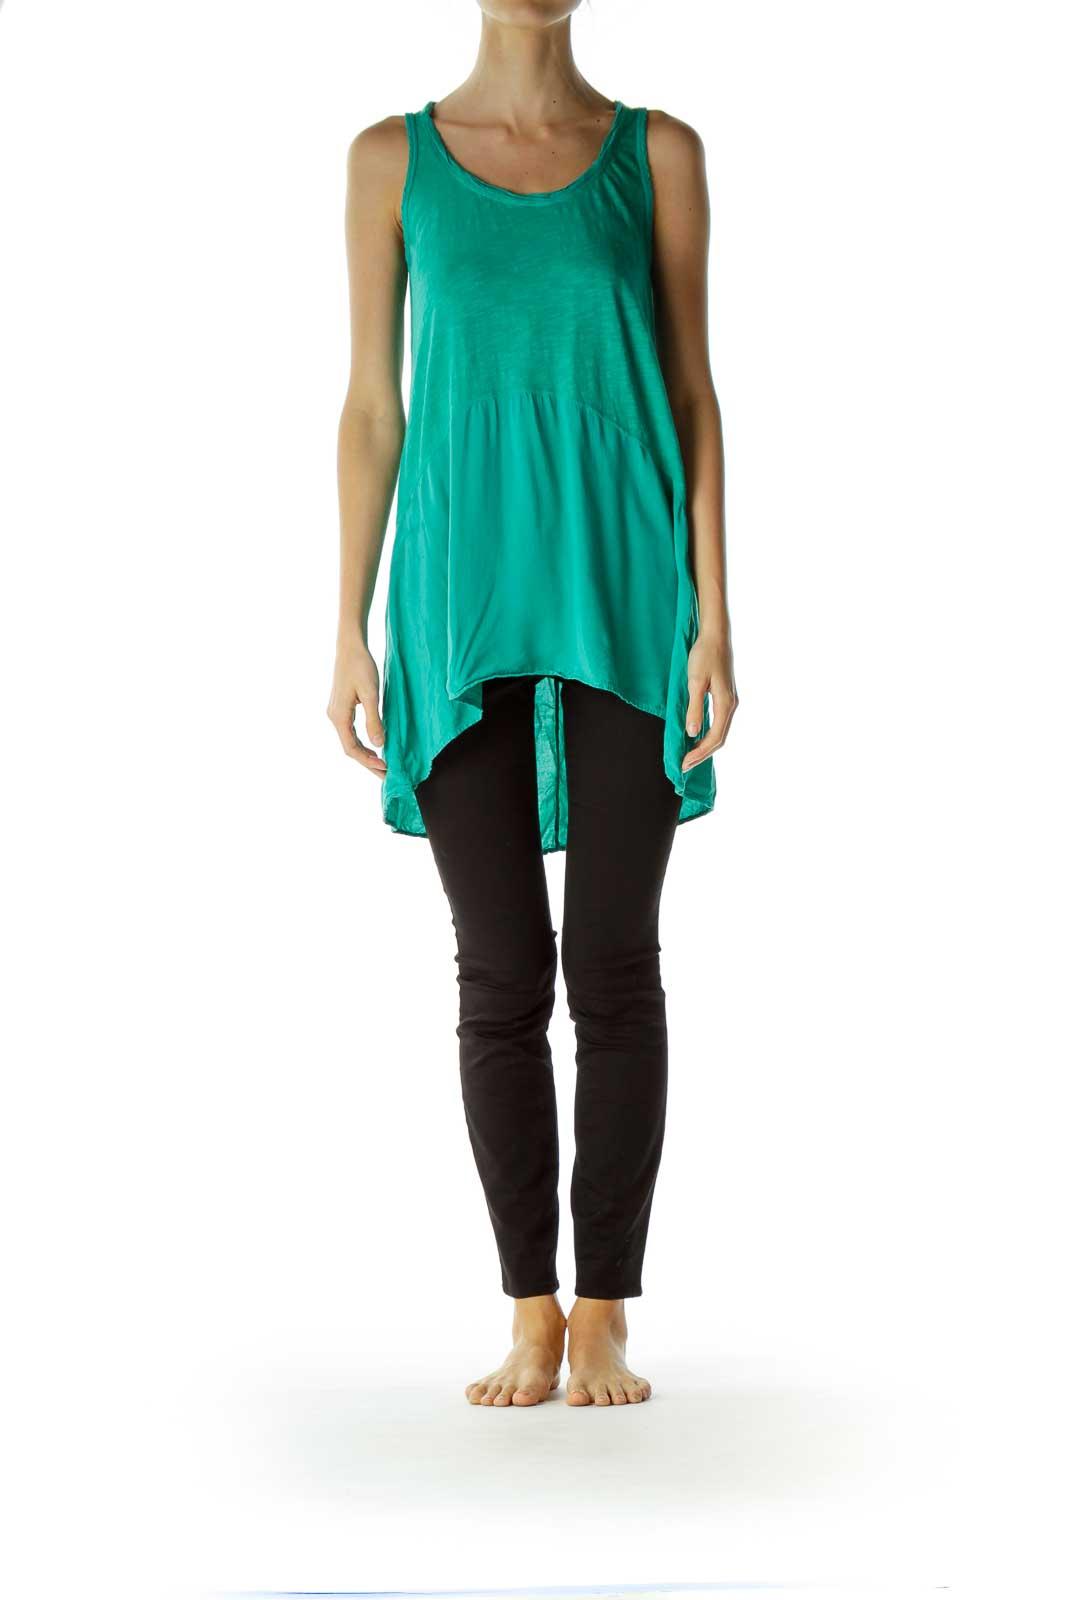 Green Sleeveless Top